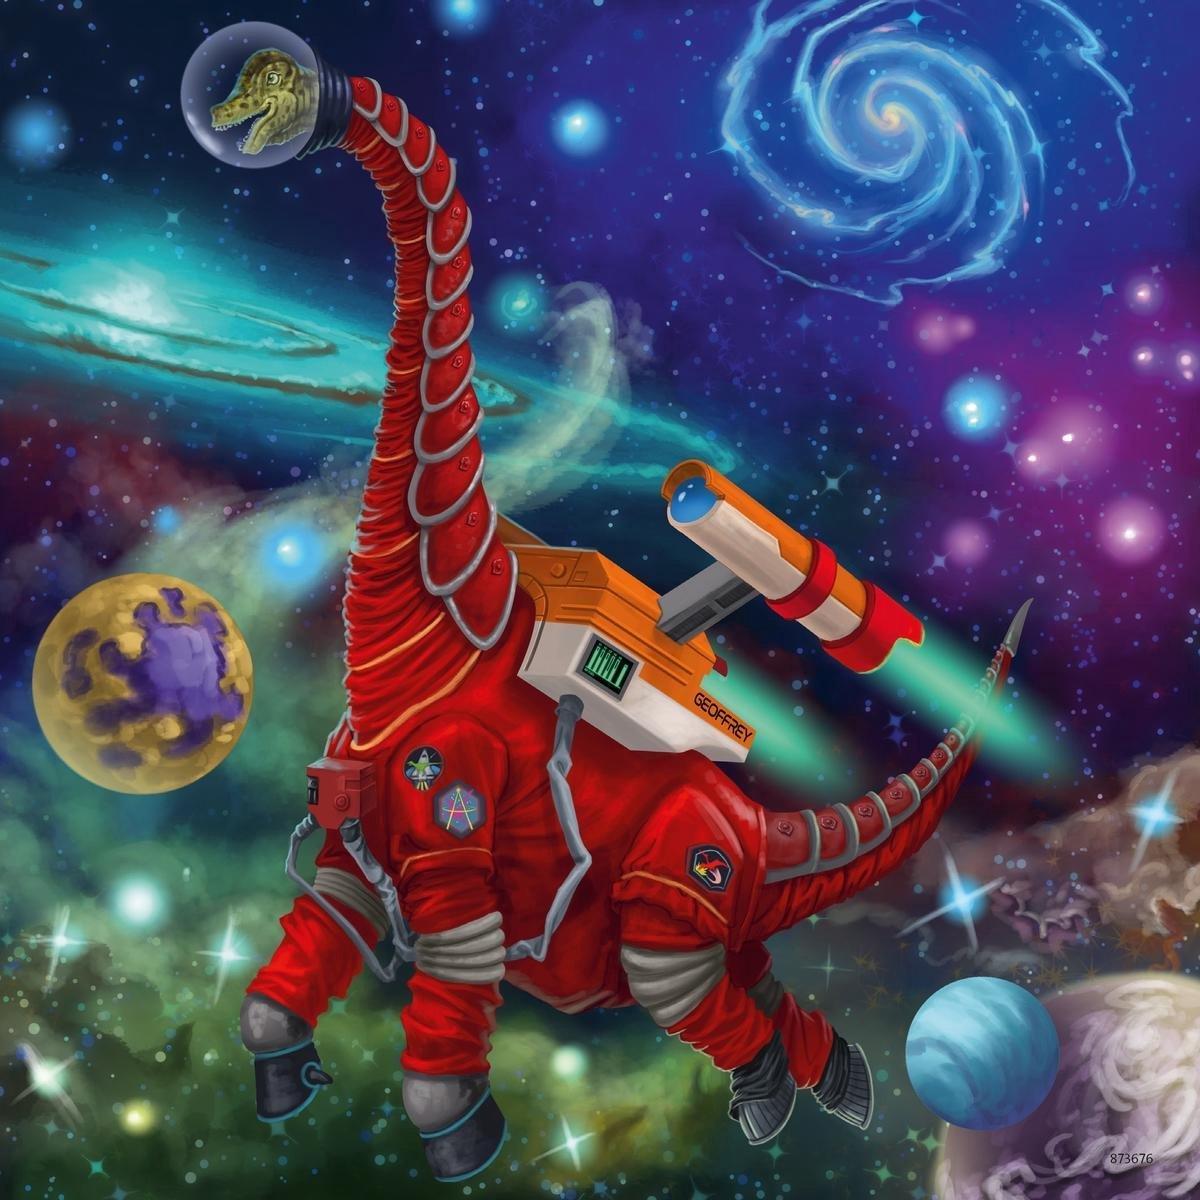 ,Puzzel ravensburger dinosauries in de ruimte 3x49 stukjes